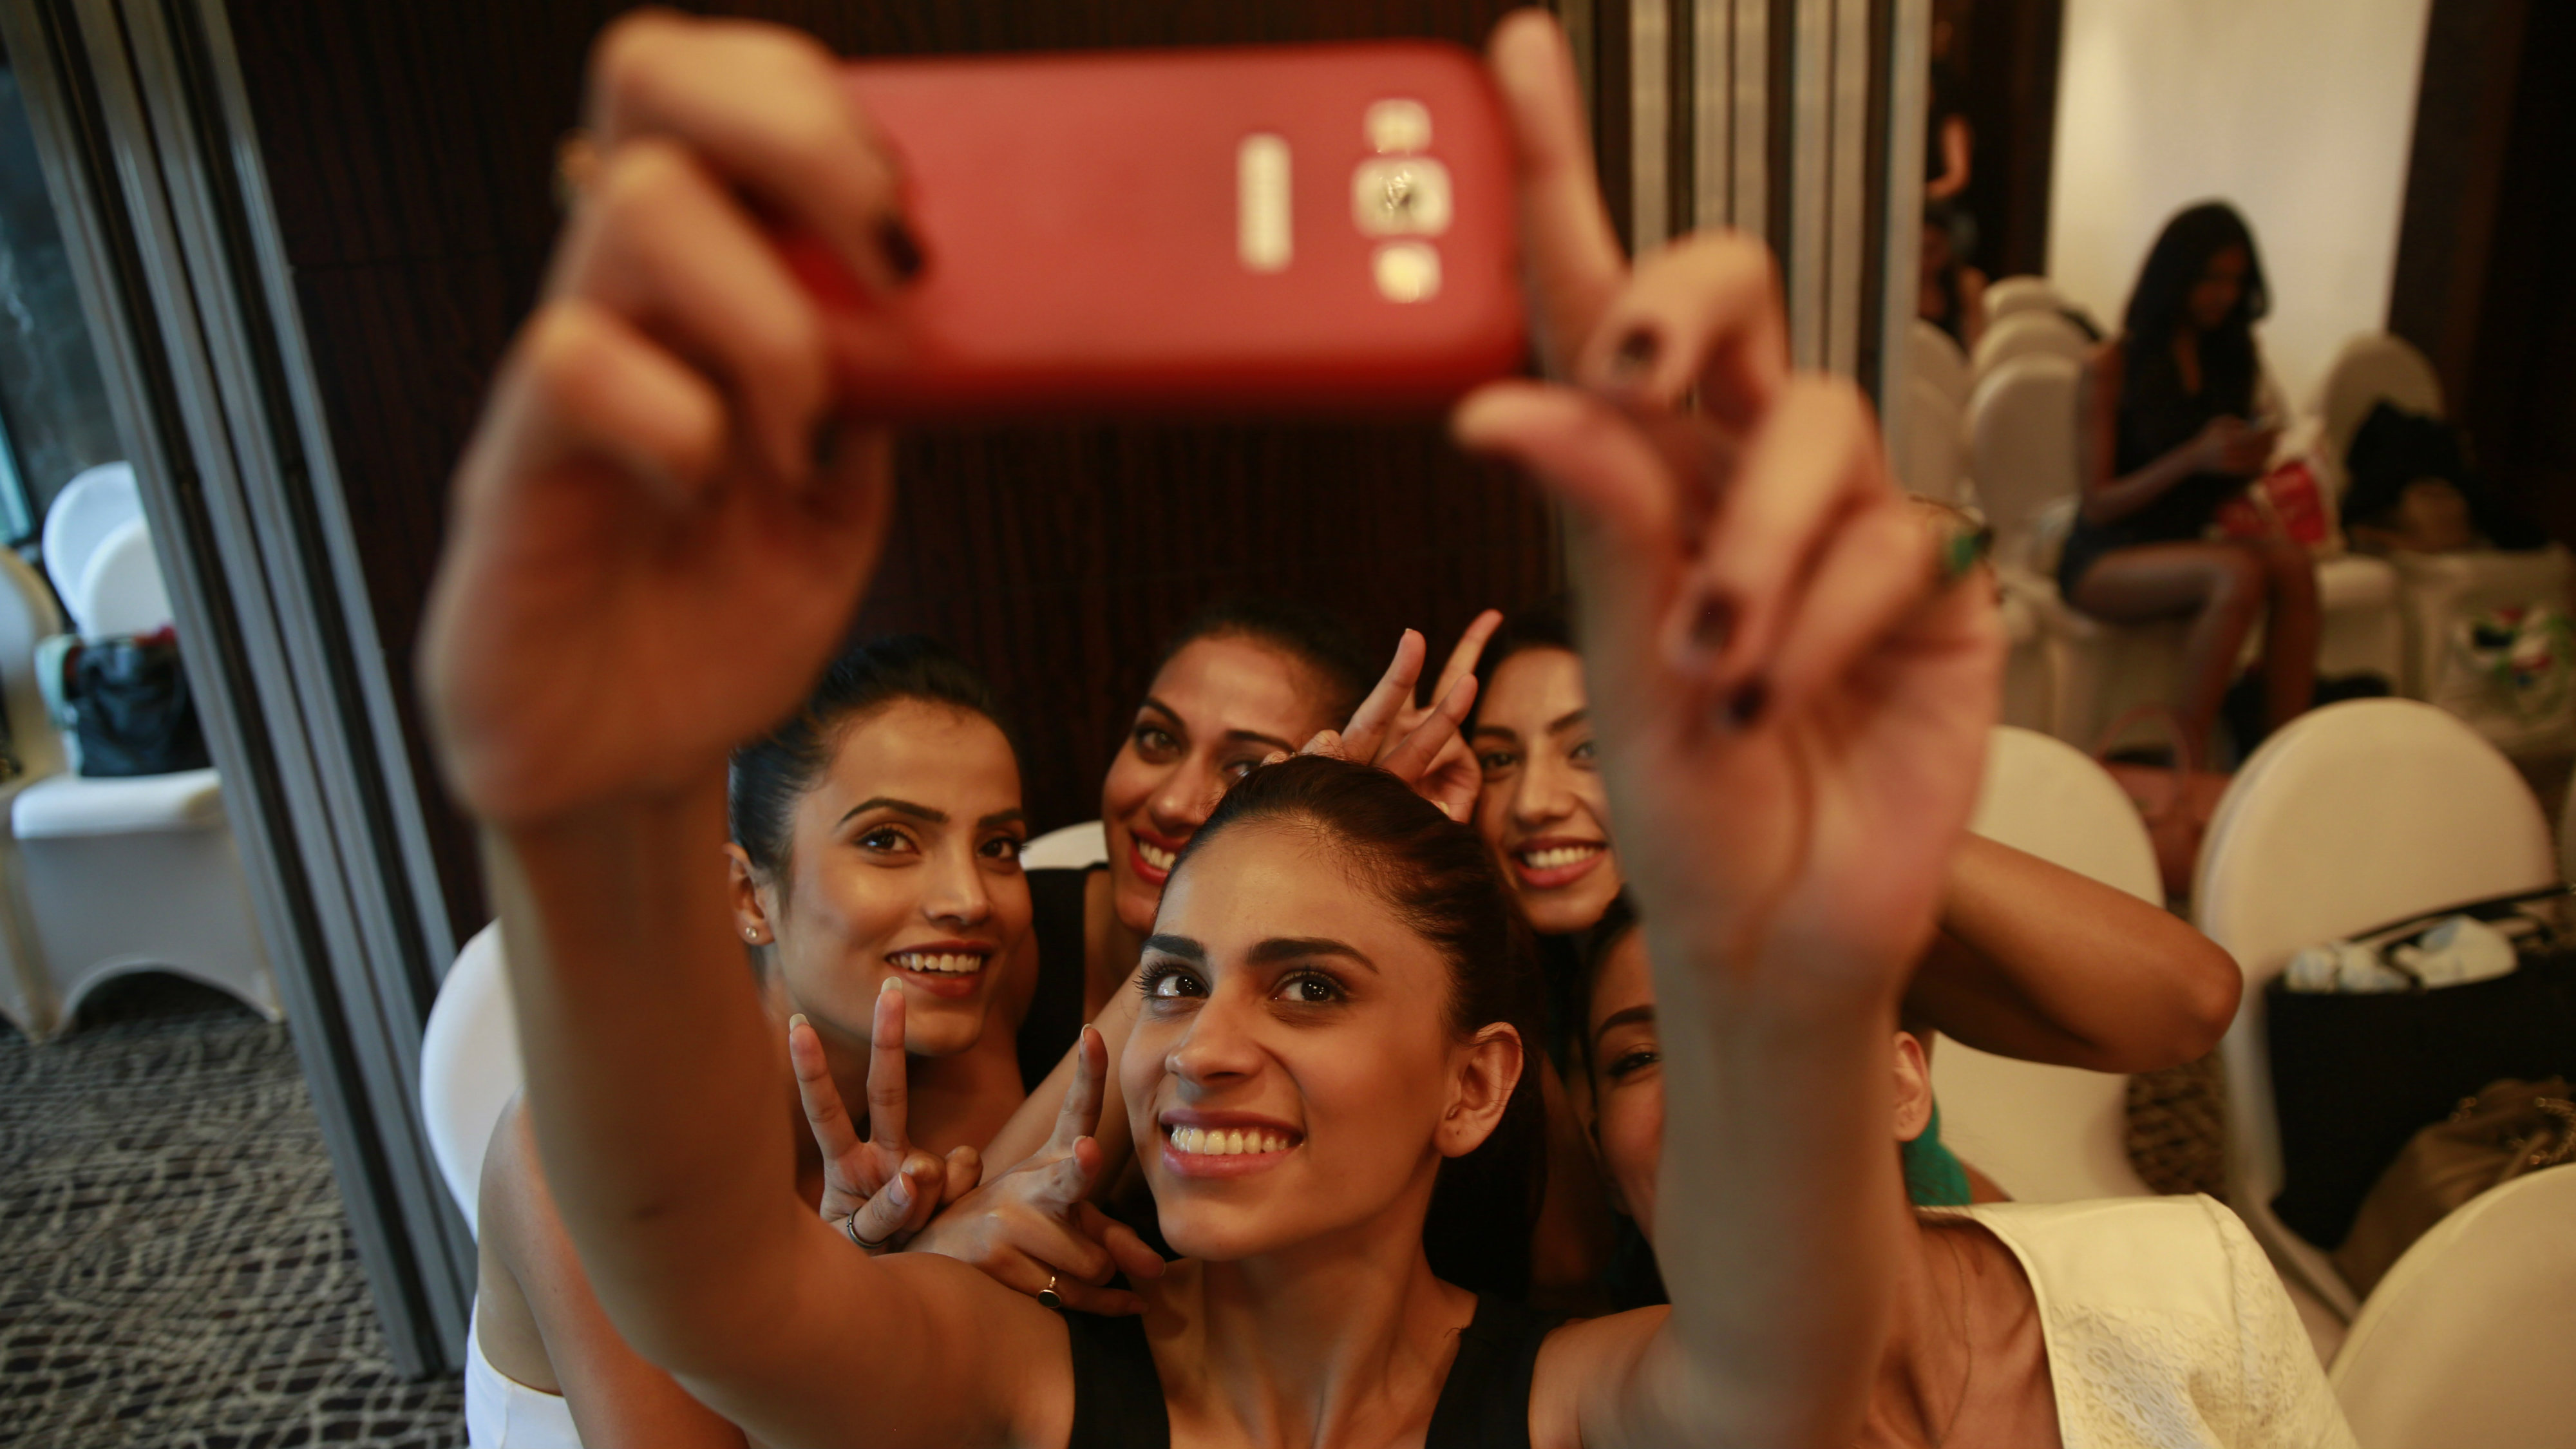 india smartphone models